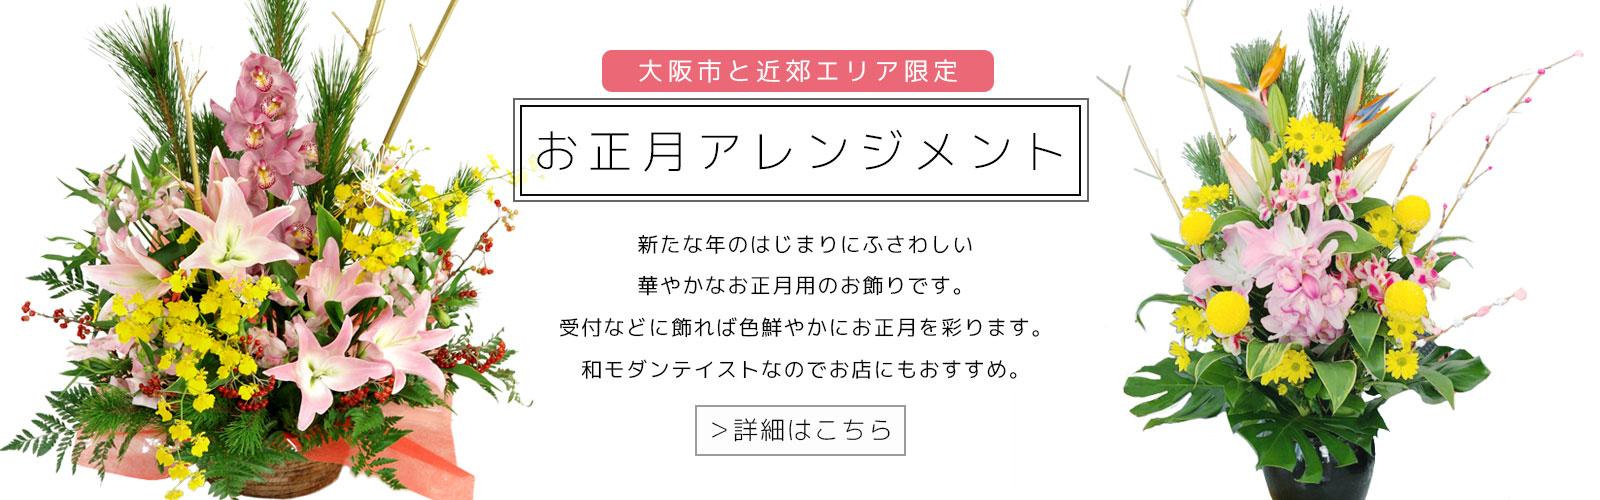 top_03_06.jpg